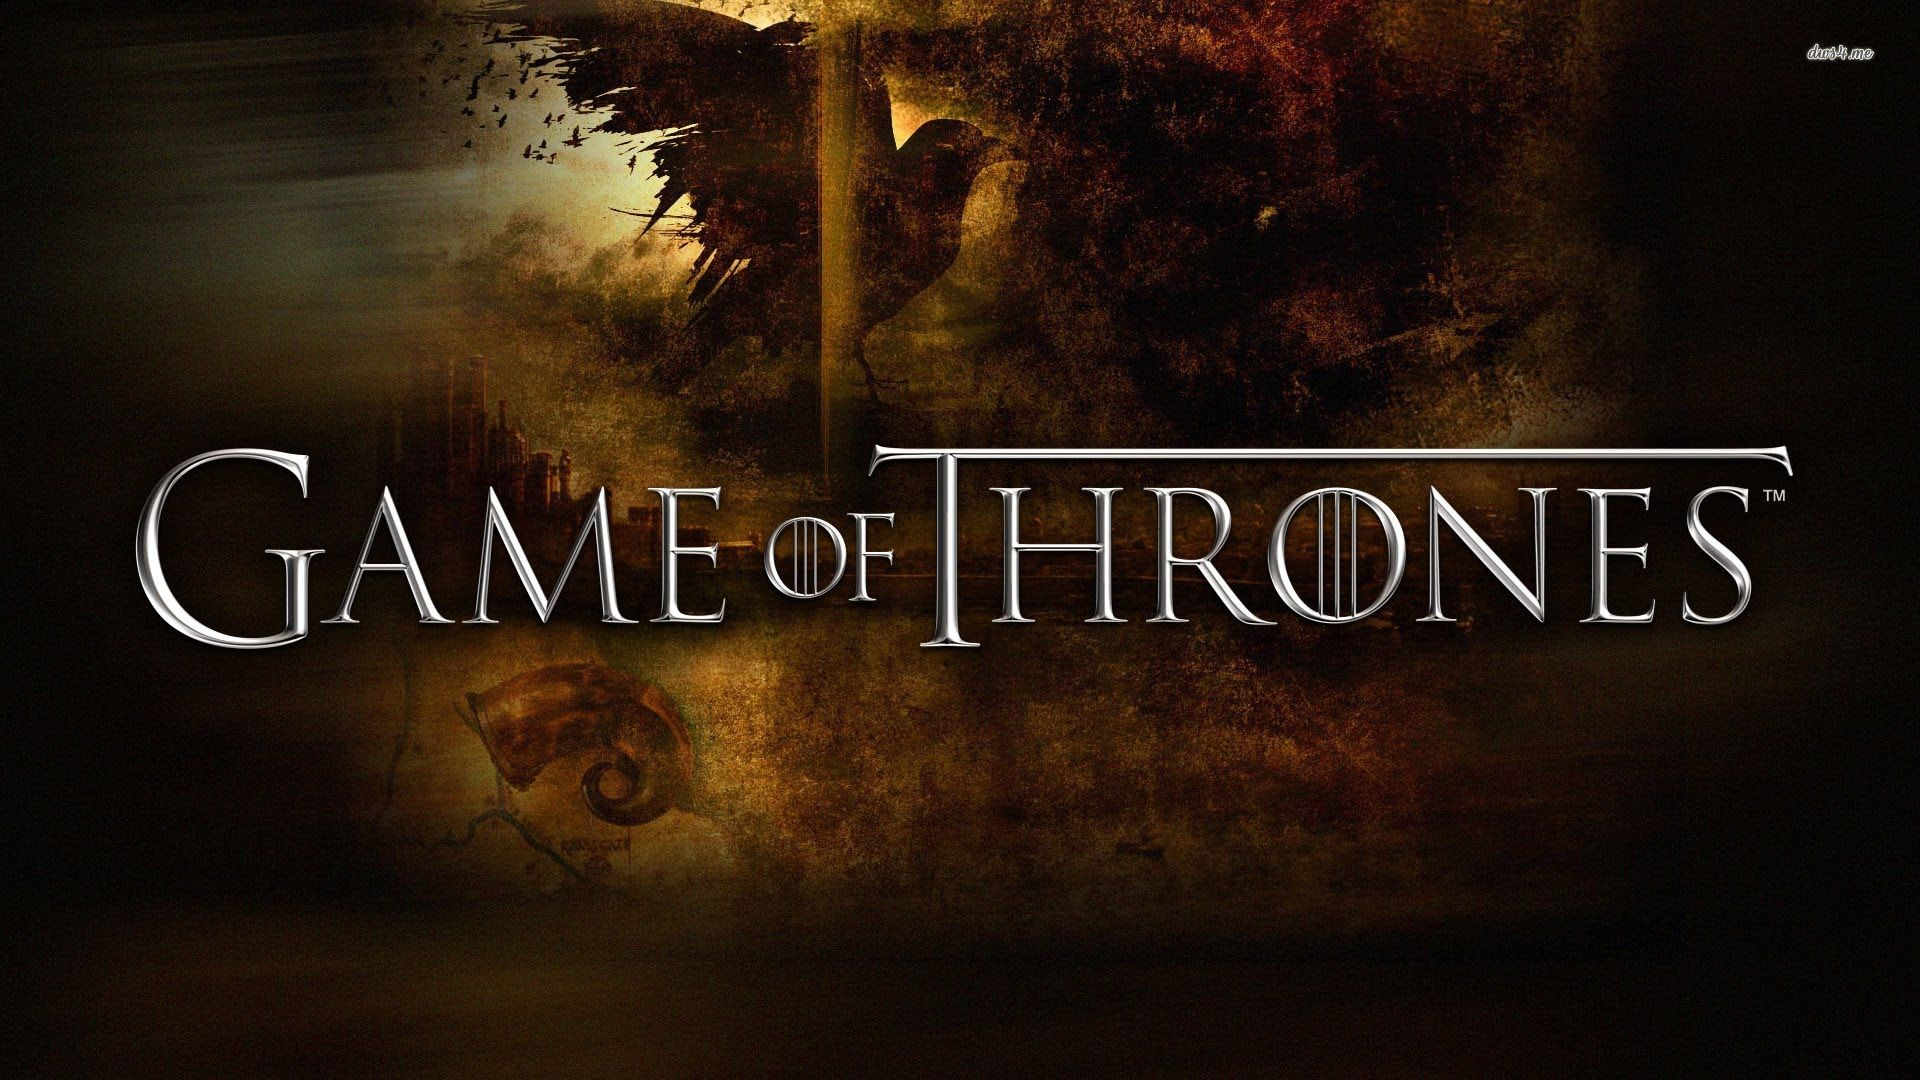 Hd Wallpapers Pack Juego De Tronos Games Of Thrones Game Of Thrones Online Watch Game Of Thrones Game Of Thrones Tv